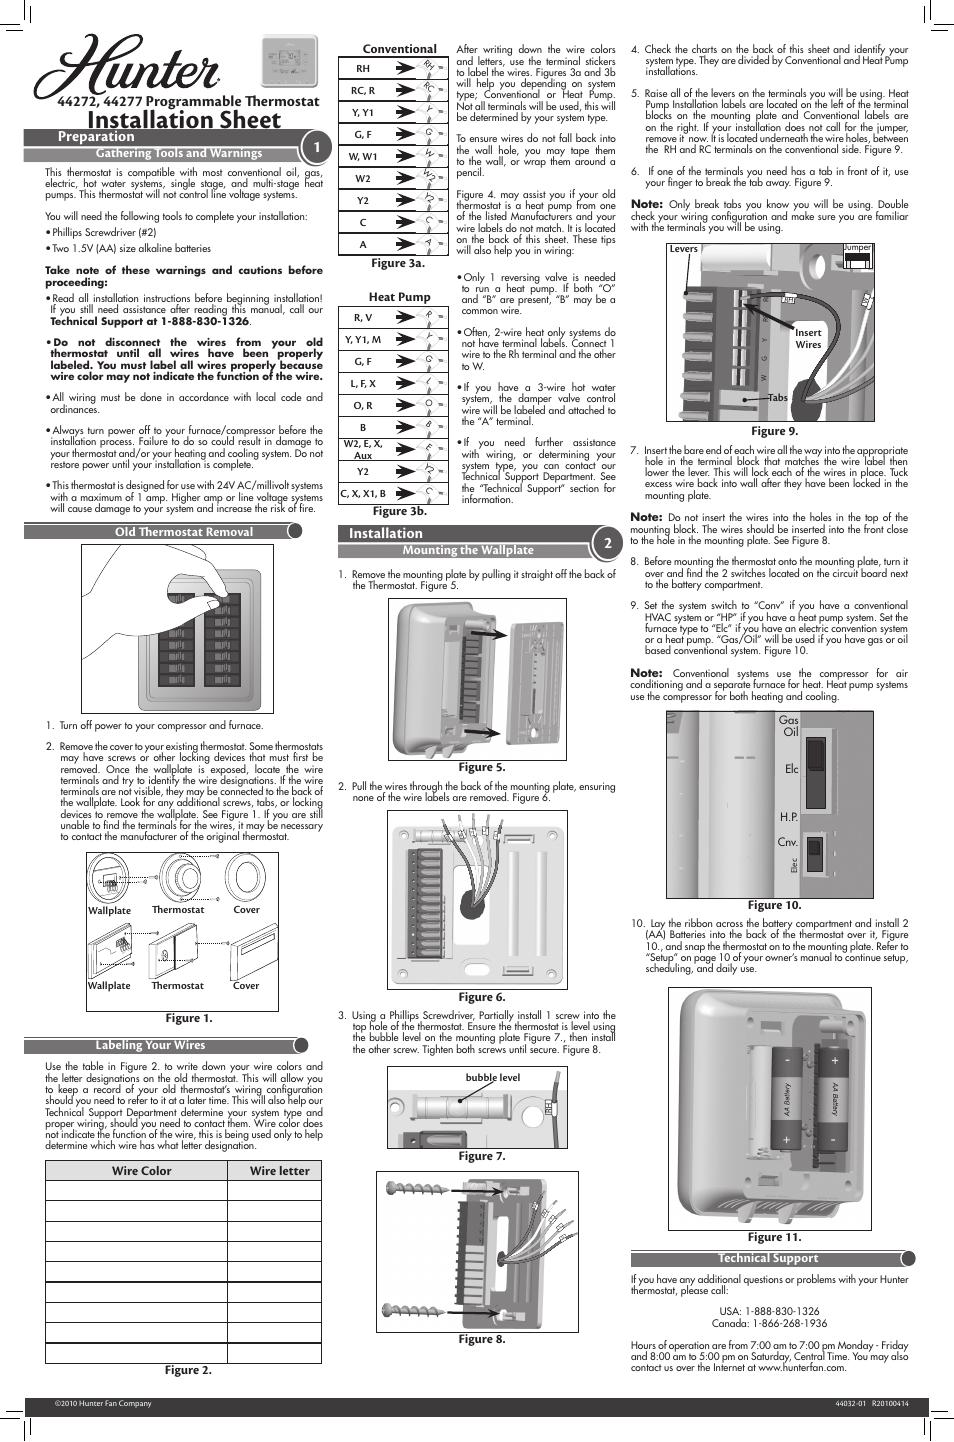 hunter thermostat 44665 wiring diagram hunter thermostat 44260 wiring diagram 2wire